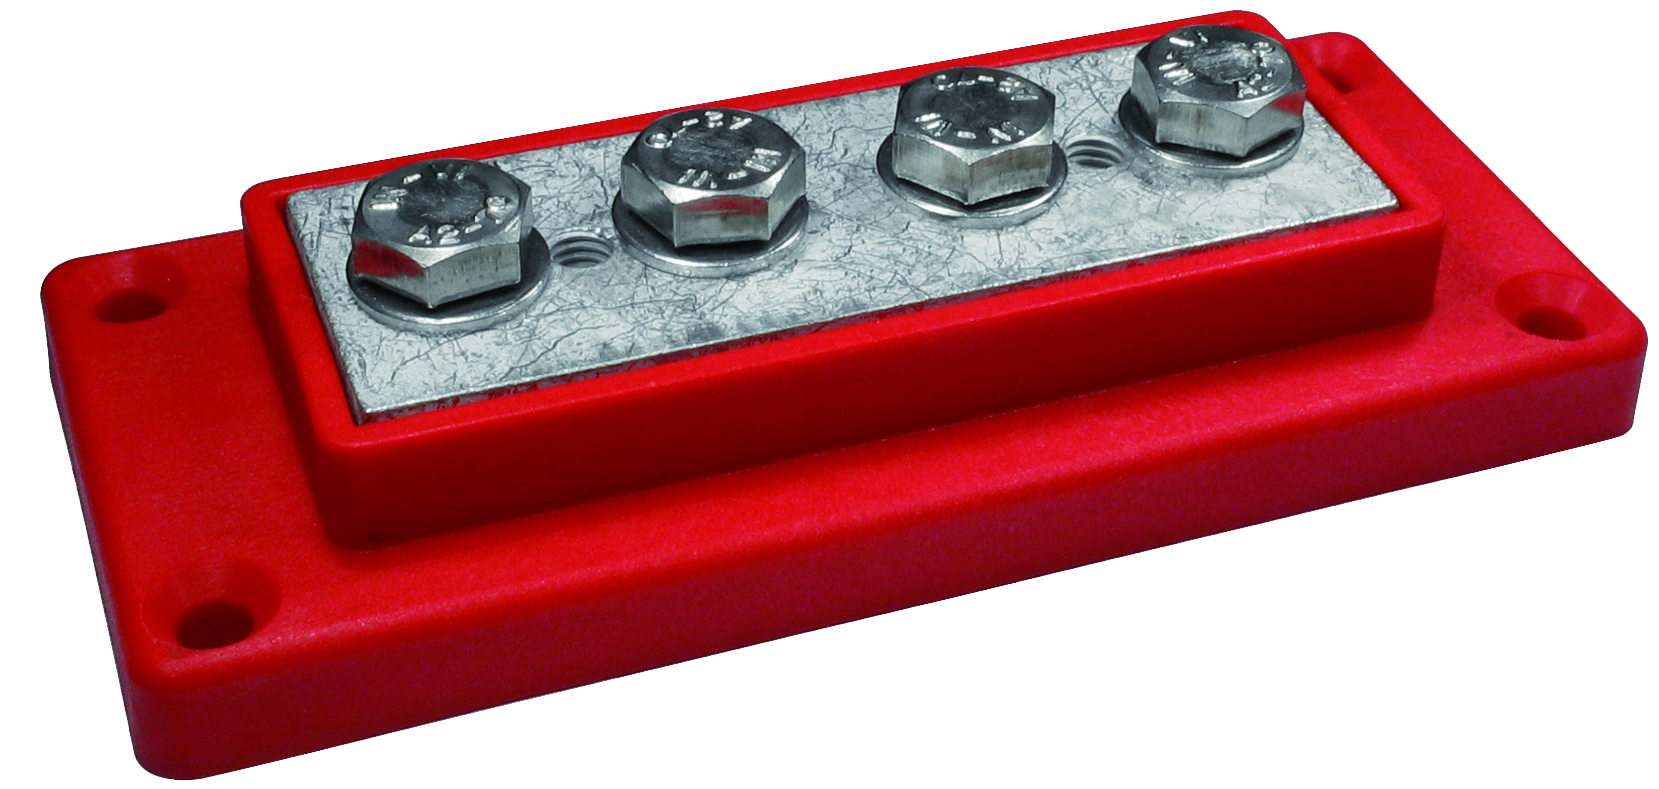 Kopplingsplint röd 3 x 50 +8 x 16 mm²